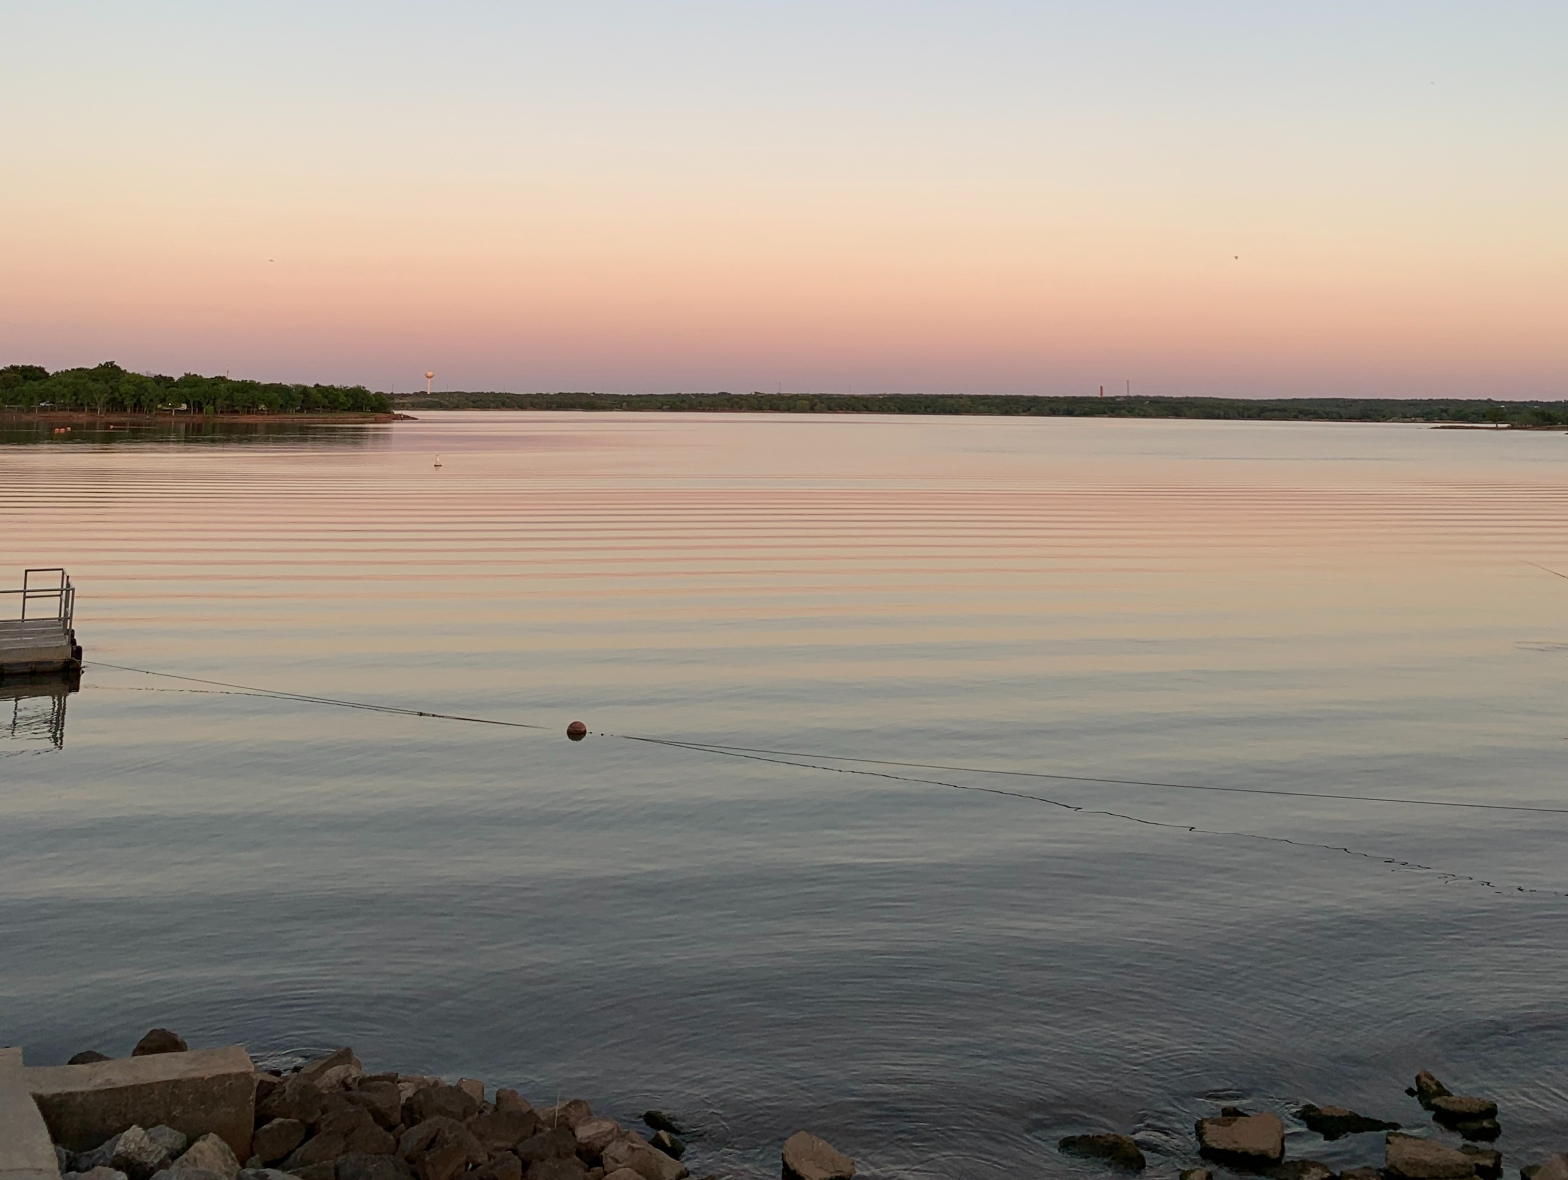 Sun set of a lake